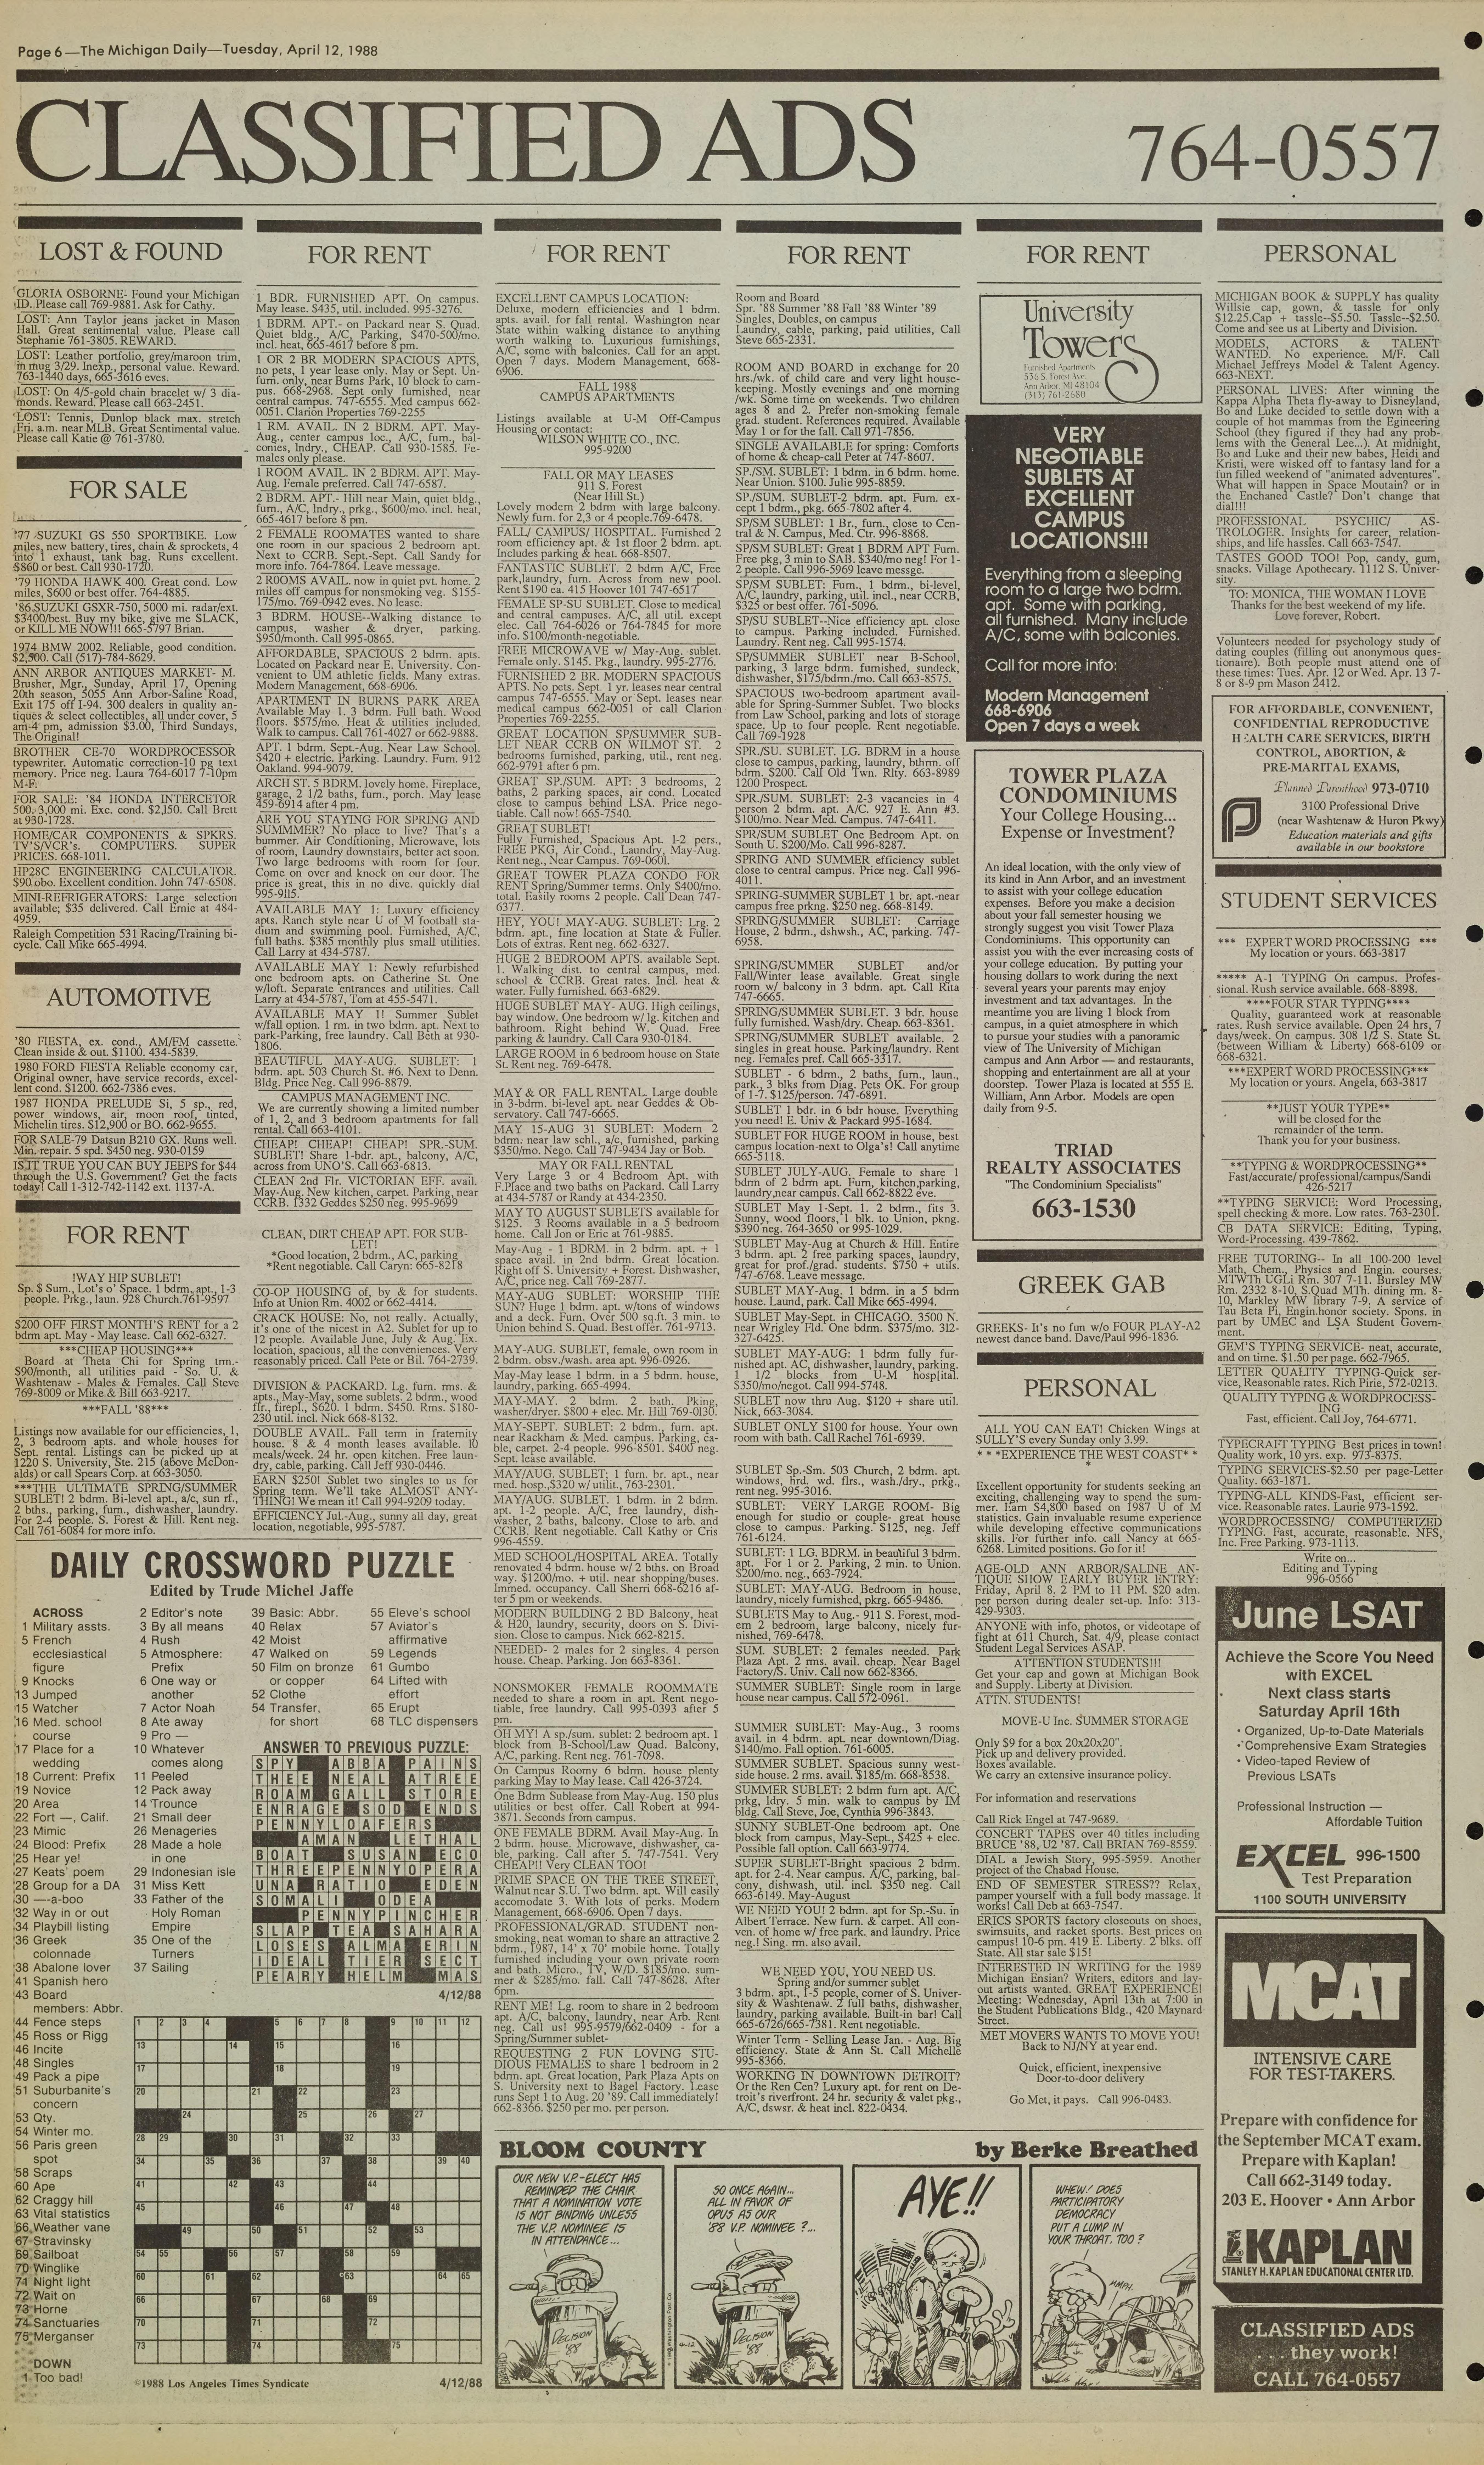 Michigan Daily Digital Archives - April 12, 1988 (vol. 98, iss. 130 ...